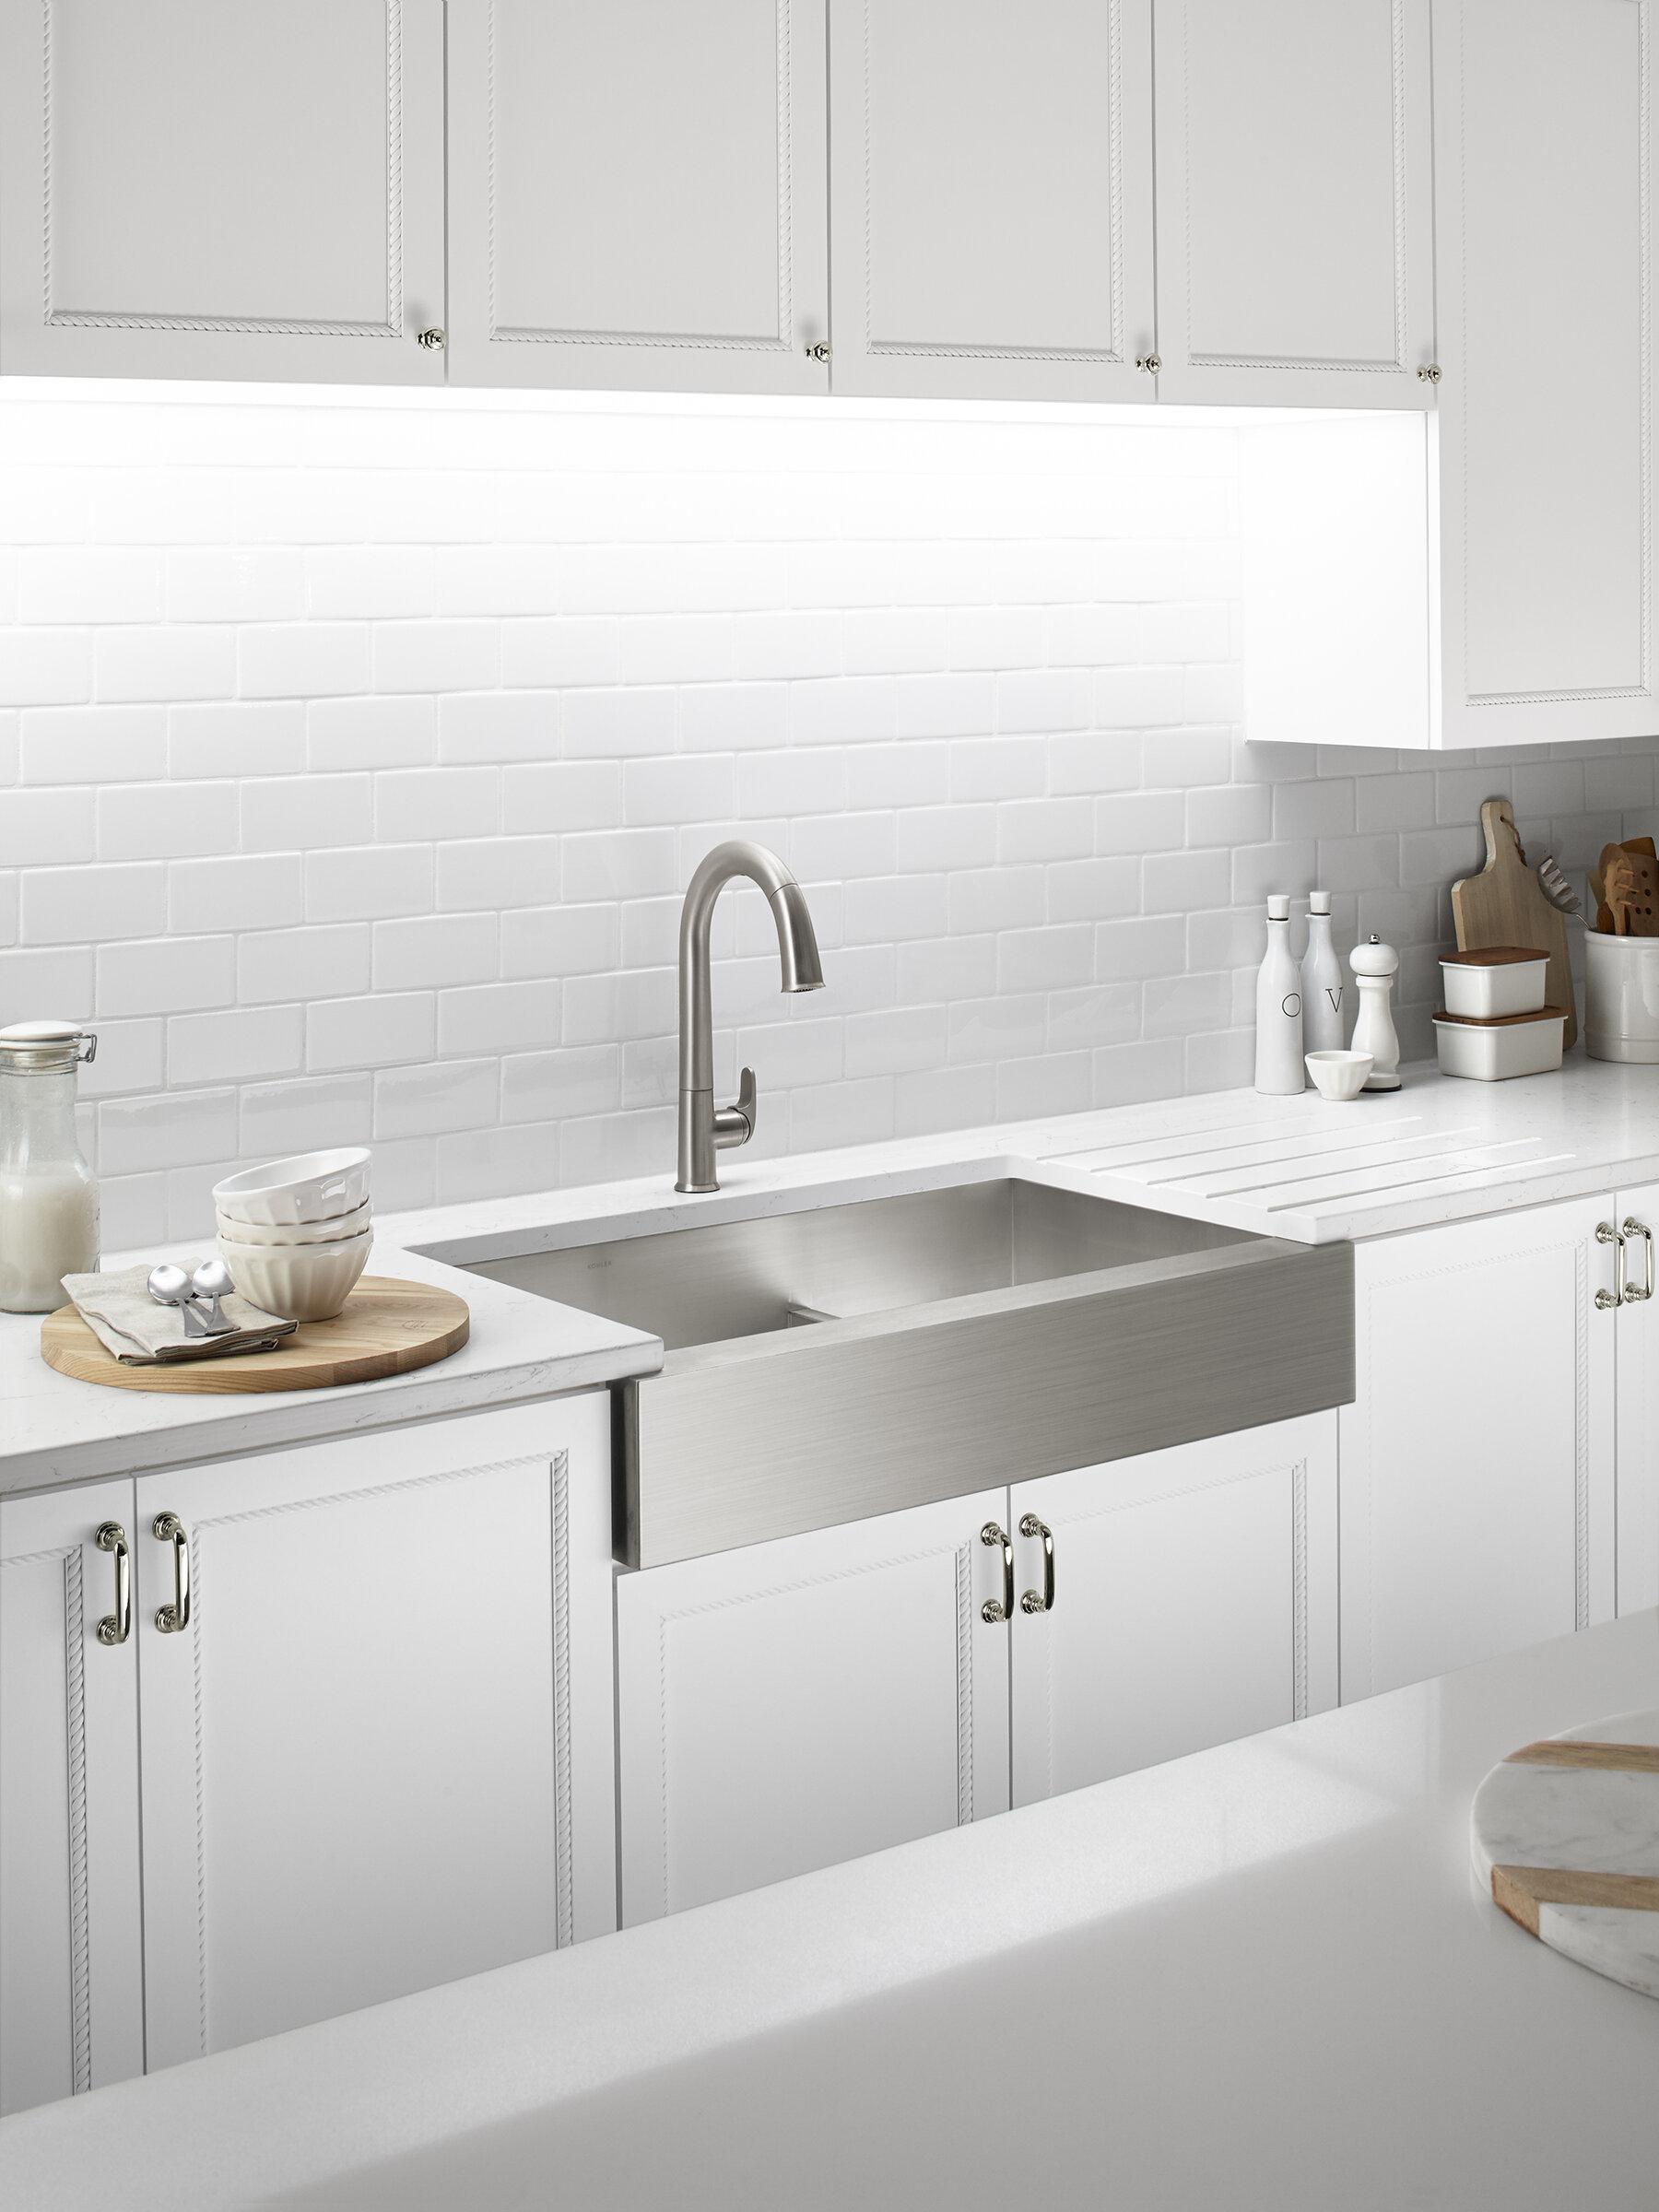 K 3945 Na Kohler Vault 36 L X 21 W Double Basin Farmhouse Kitchen Sink Reviews Wayfair